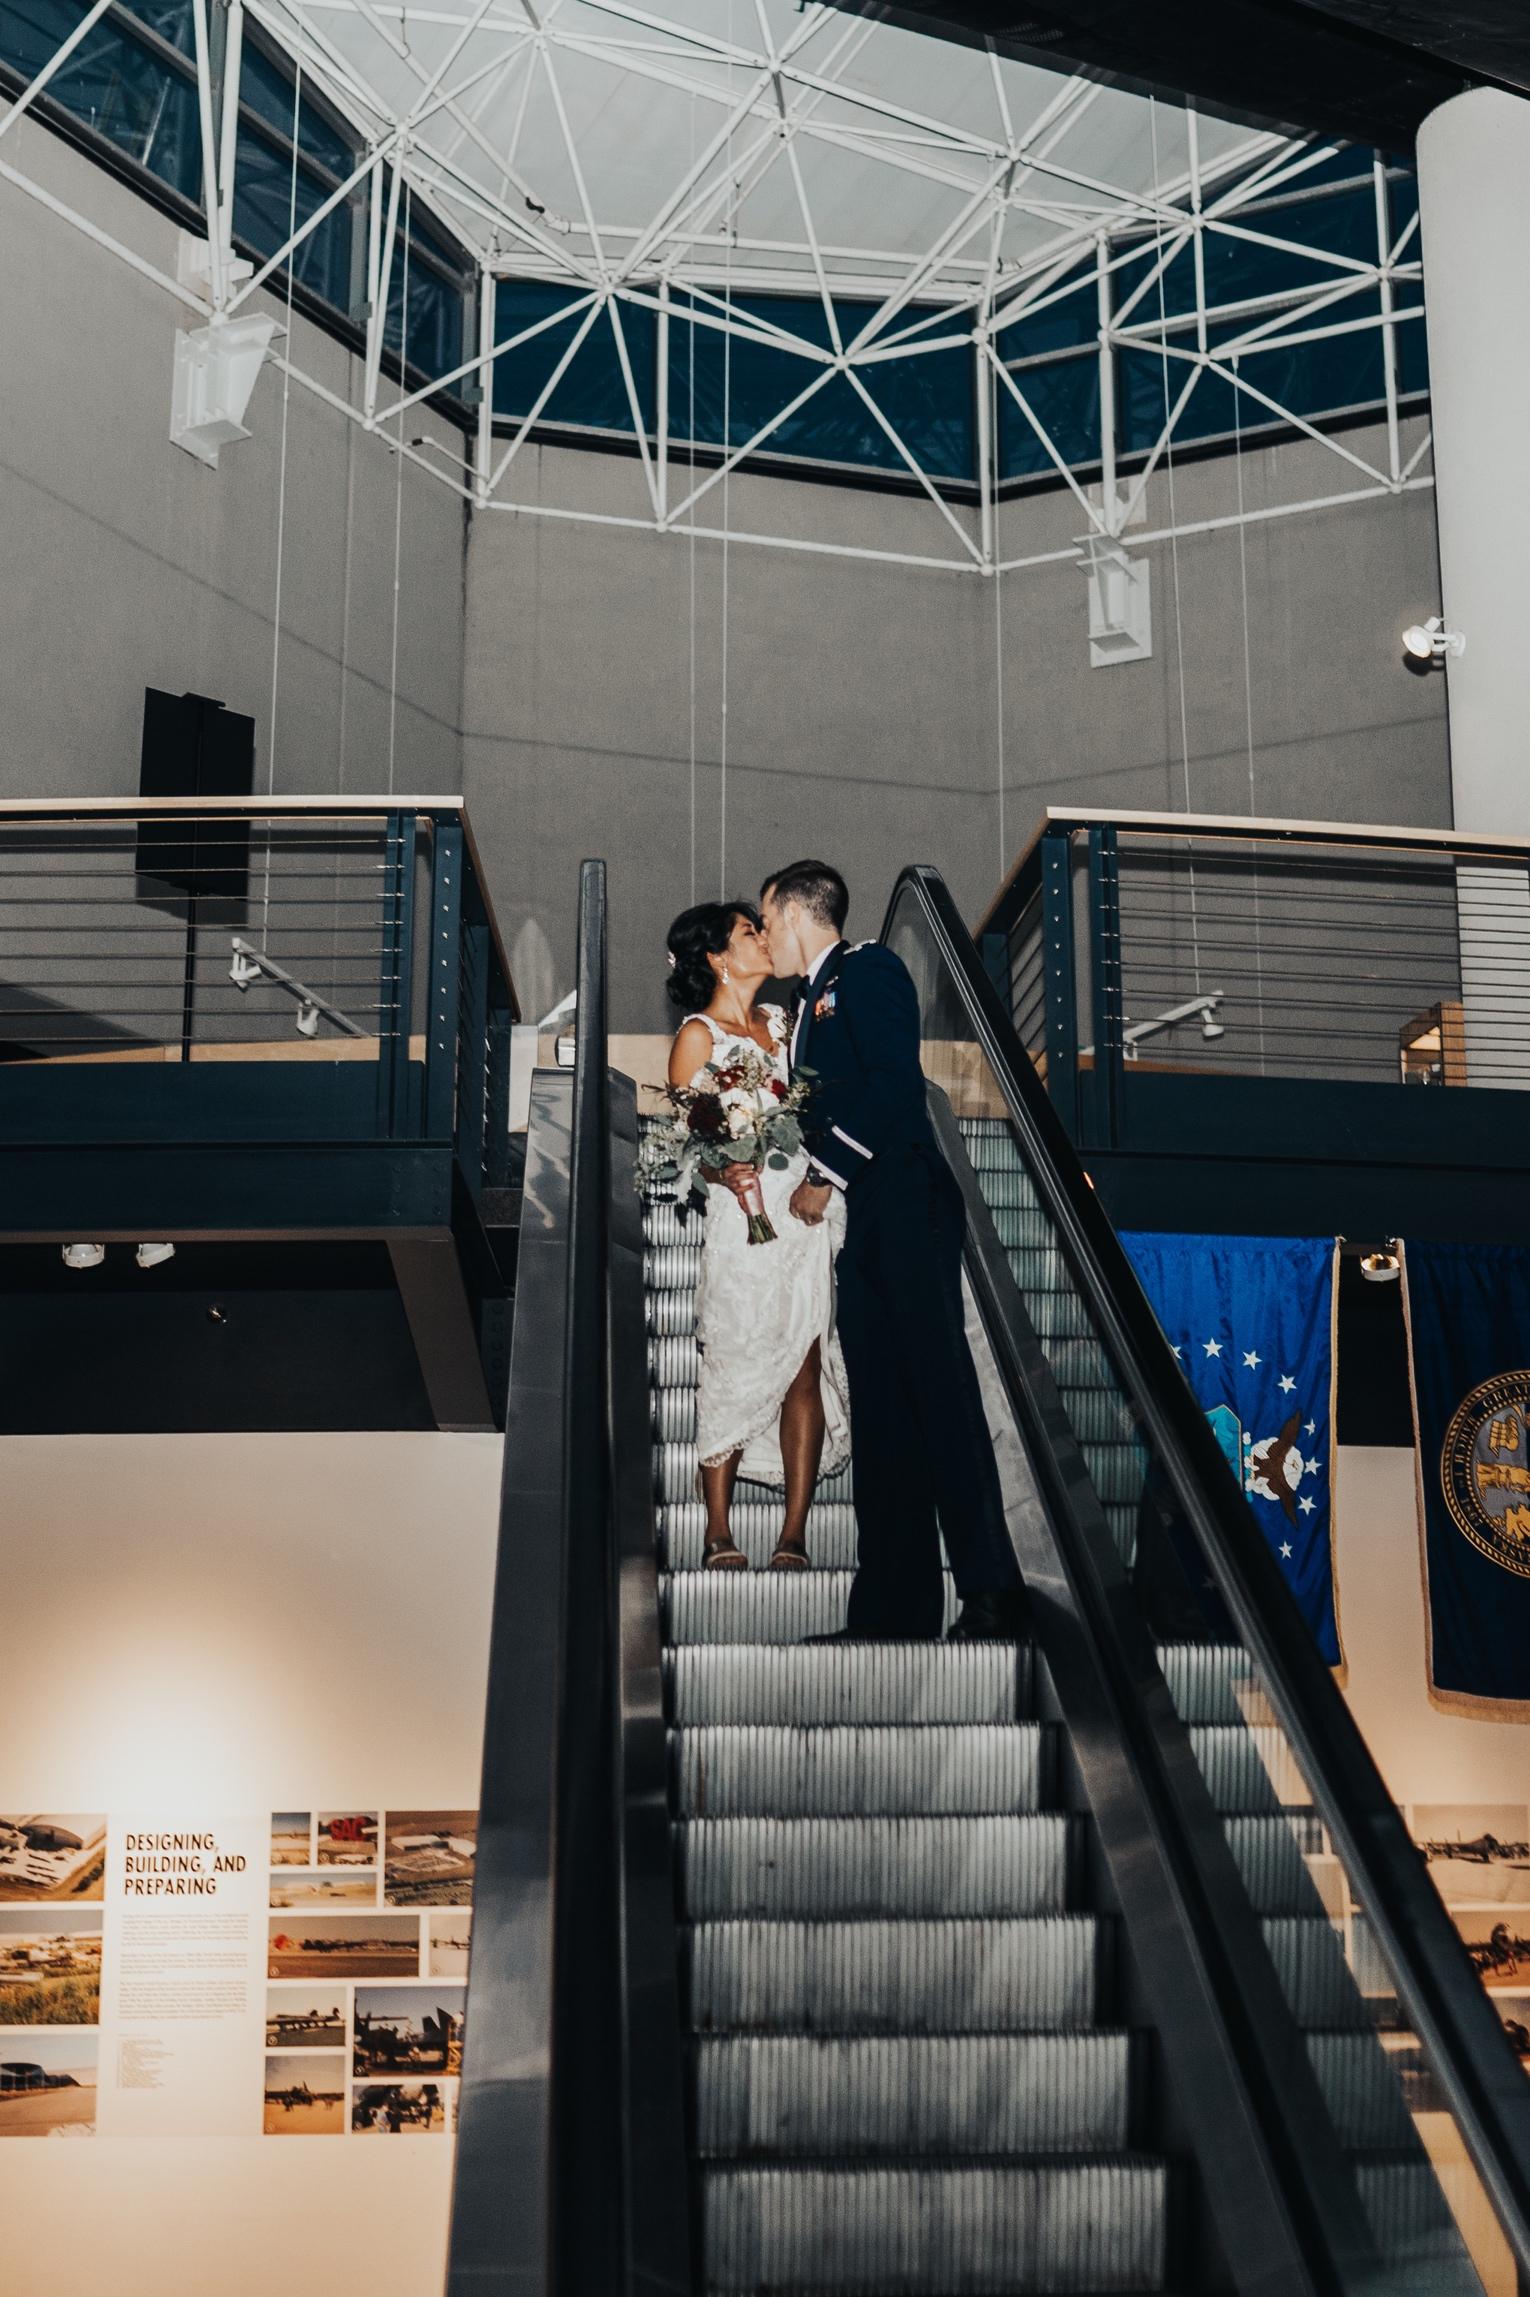 omaha wedding photography at the sac museum